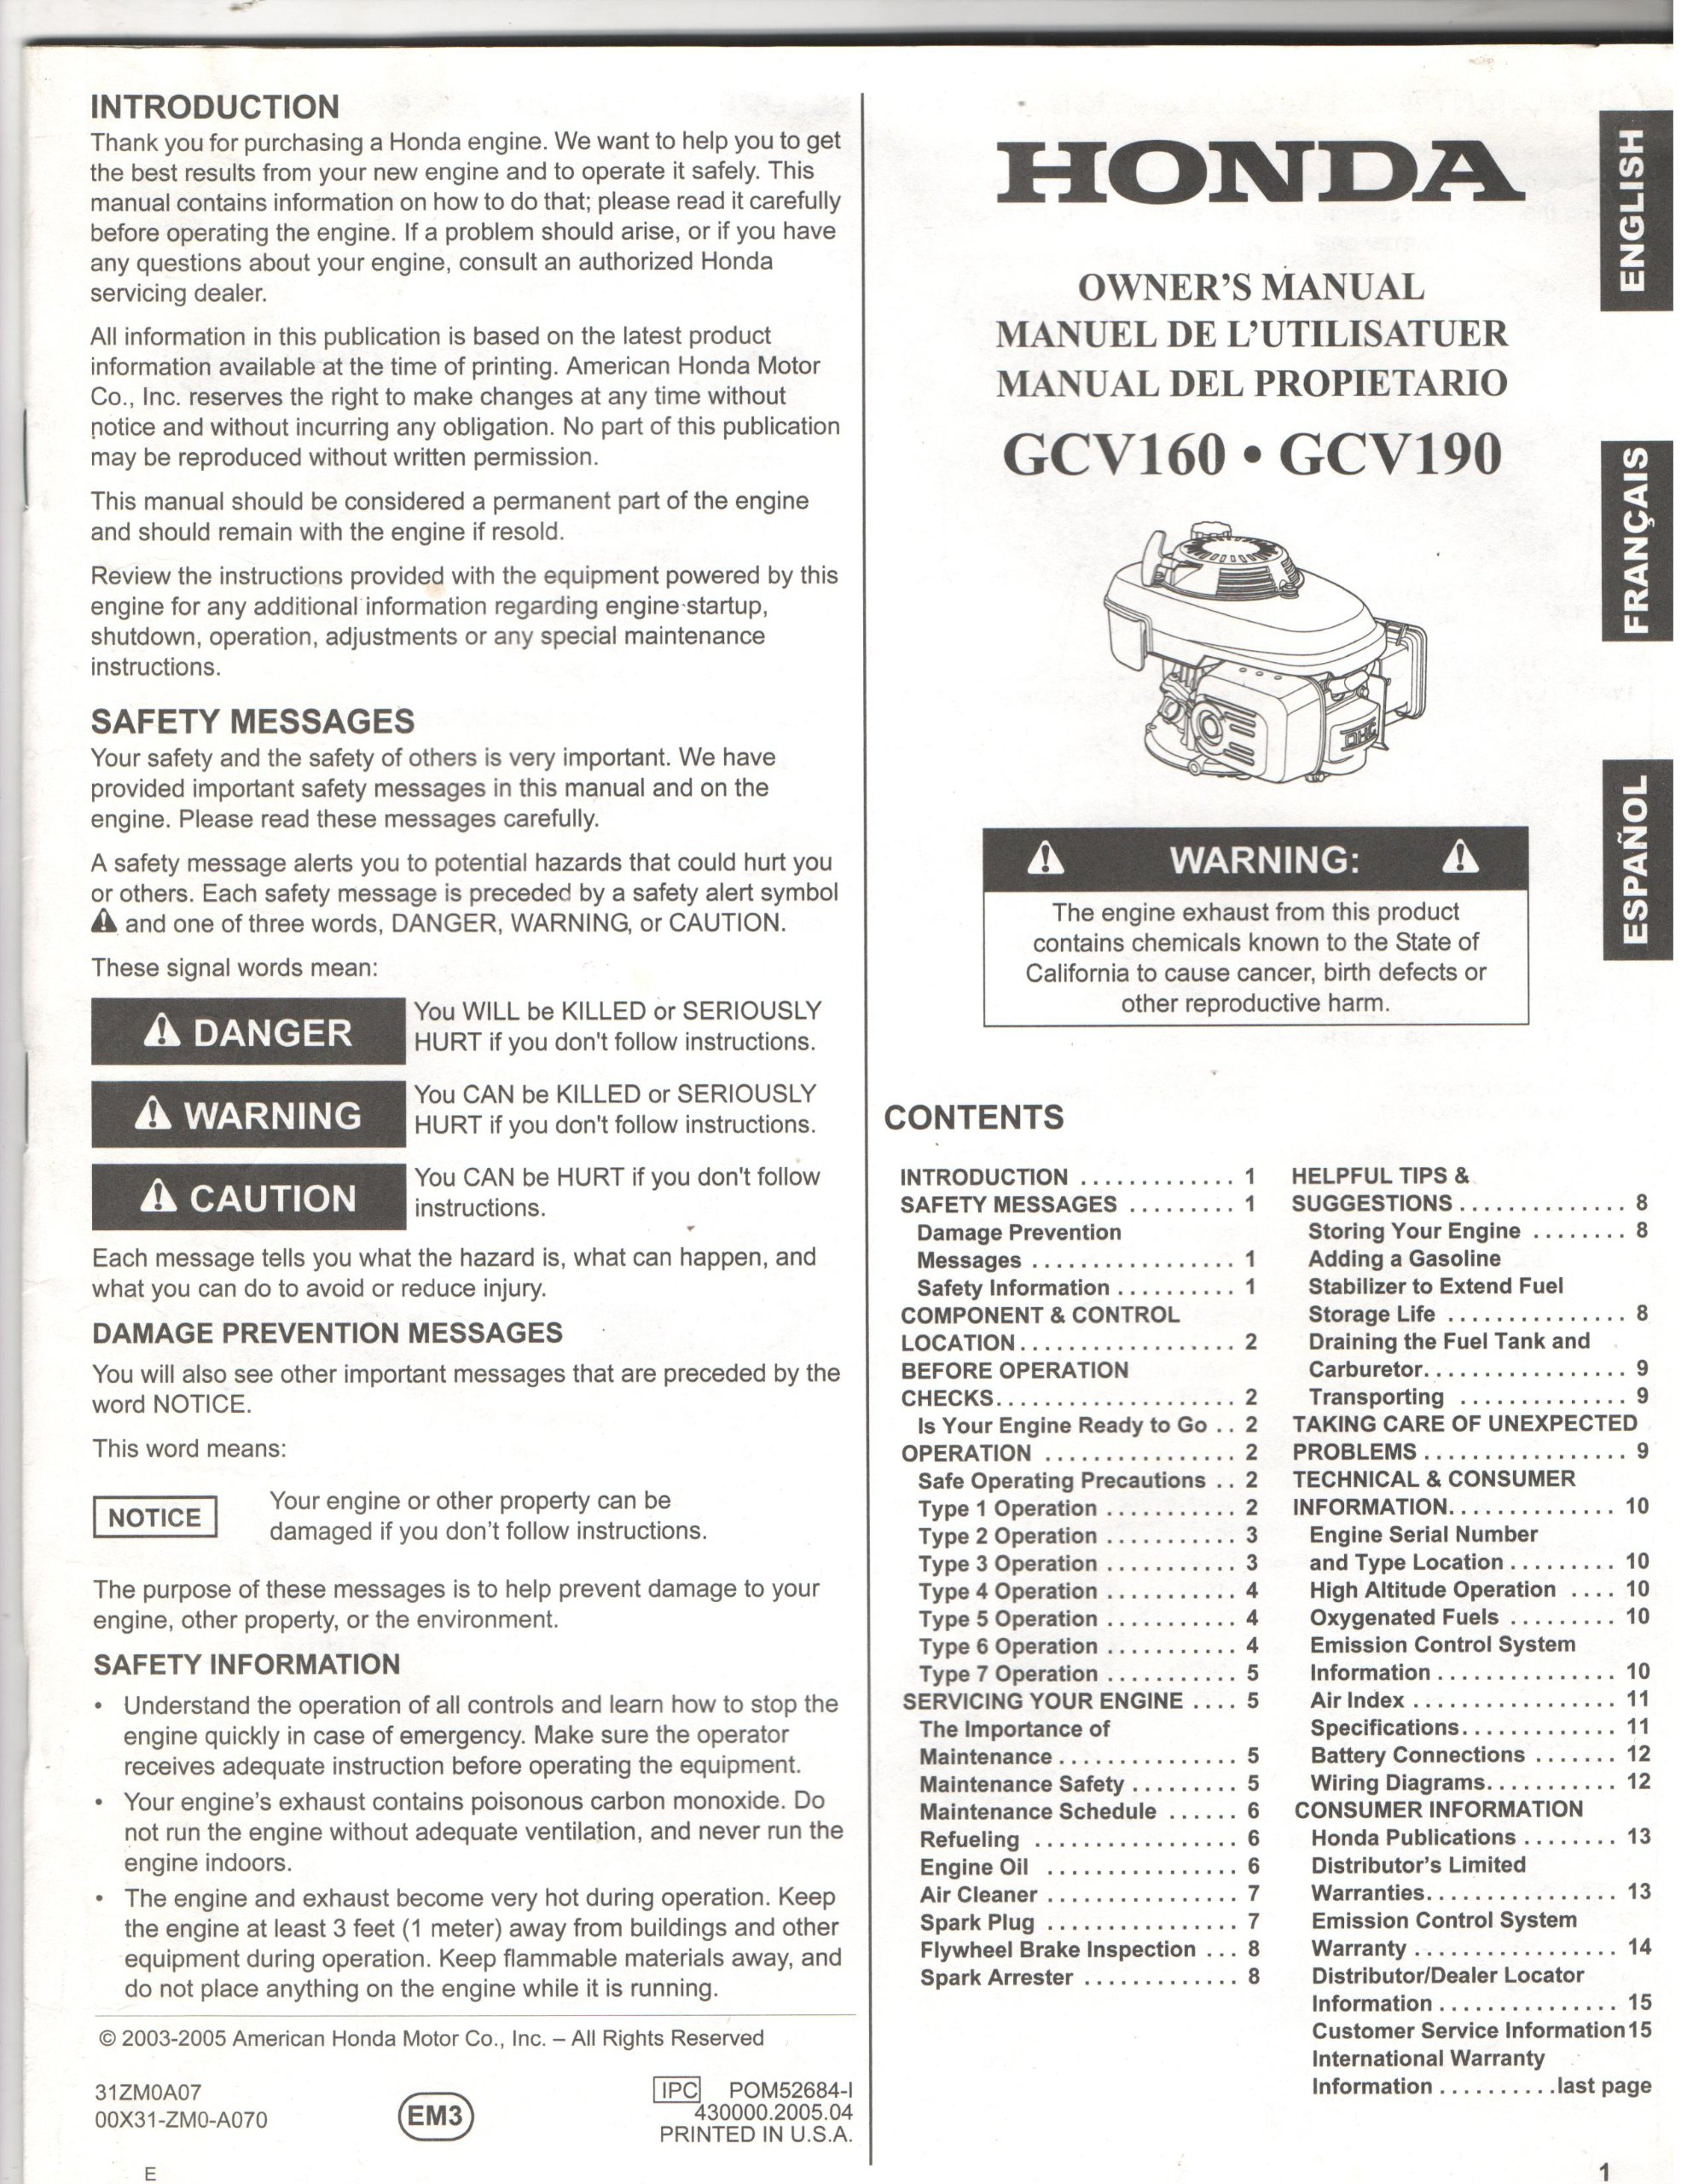 Honda Owners Manual >> Honda Owner S Manual Gcv 160 Gvc 190 Honda Amazon Com Books